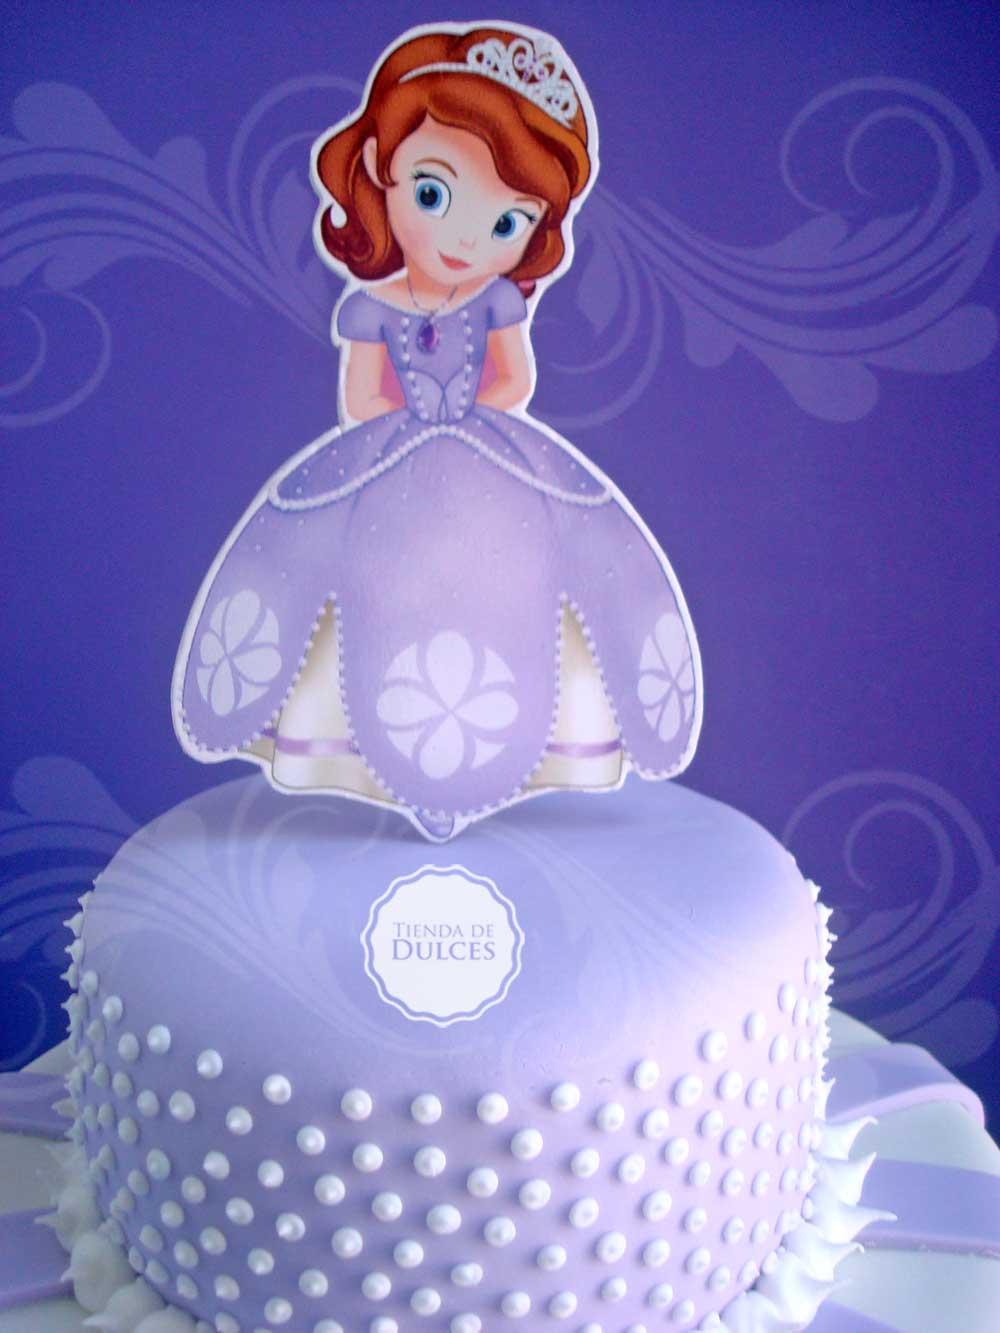 Fiesta Princesa Sofia: Collage de Ideas - wonkis.com.ar